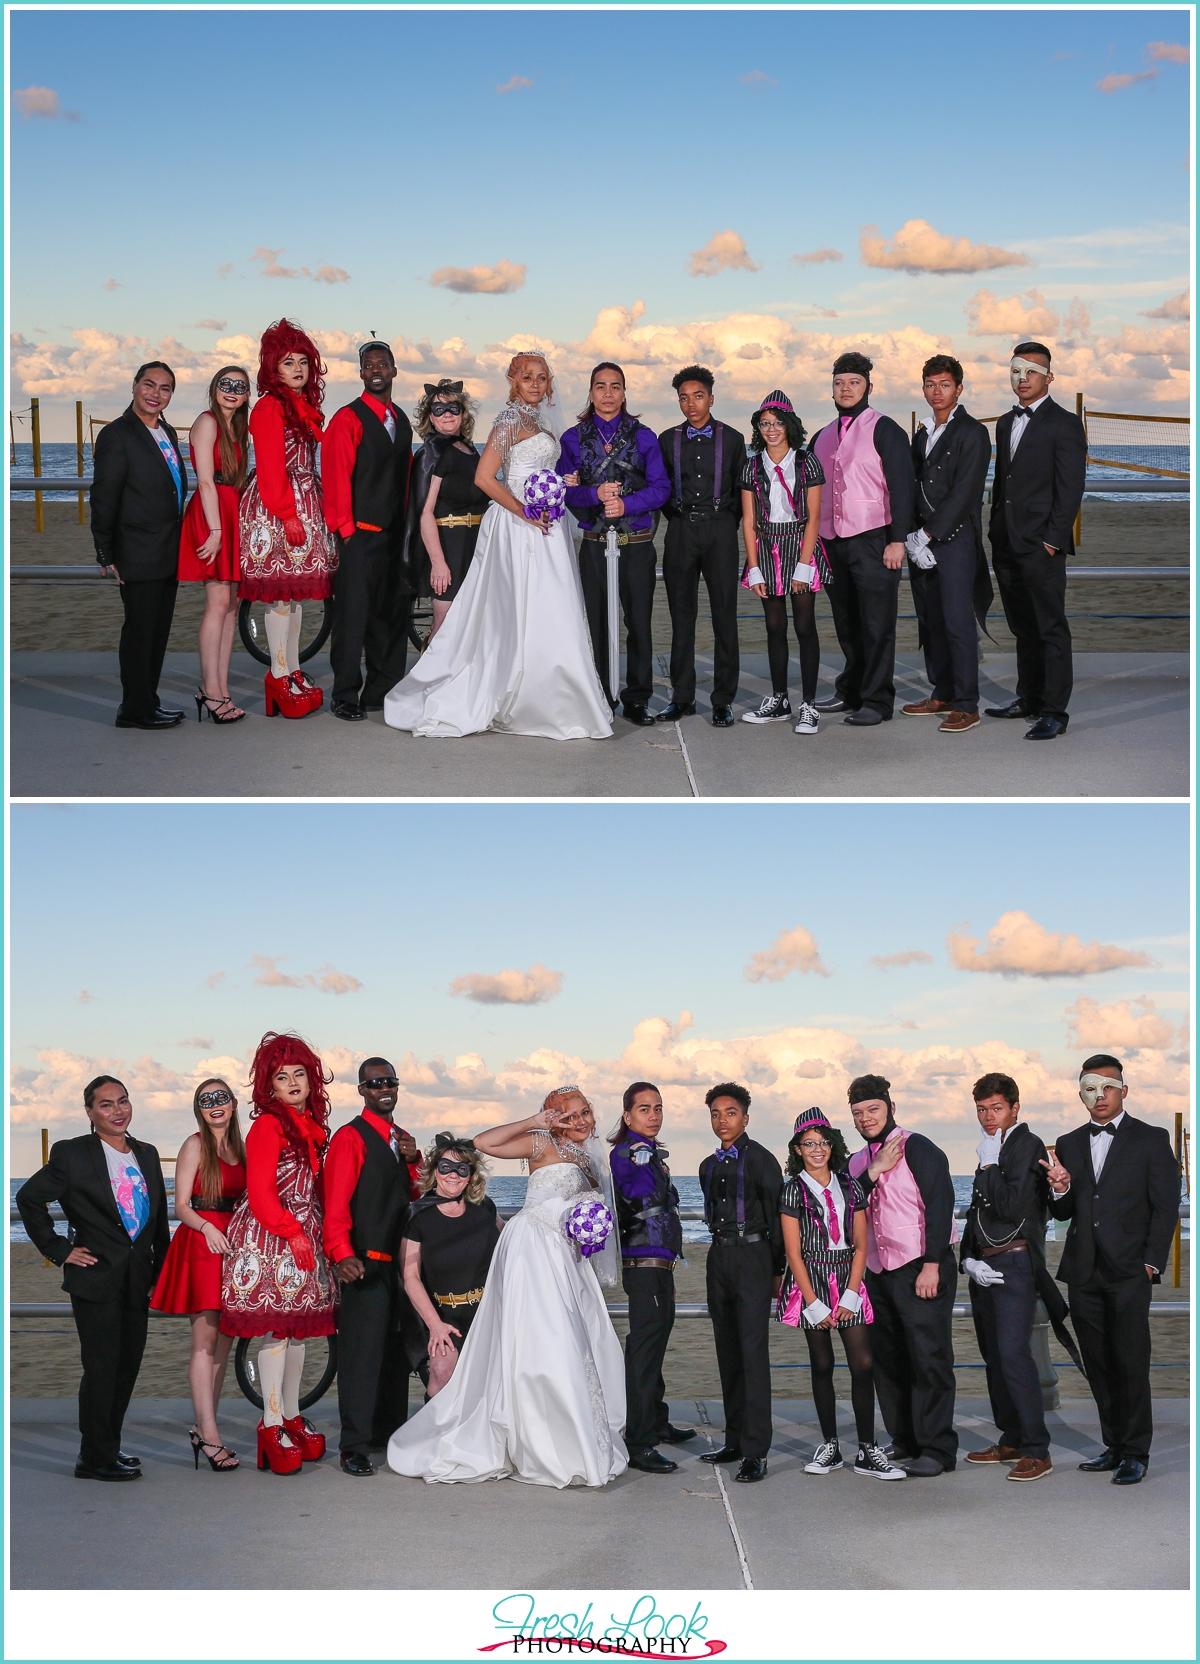 cosplay bridal party Virginia Beach oceanfront